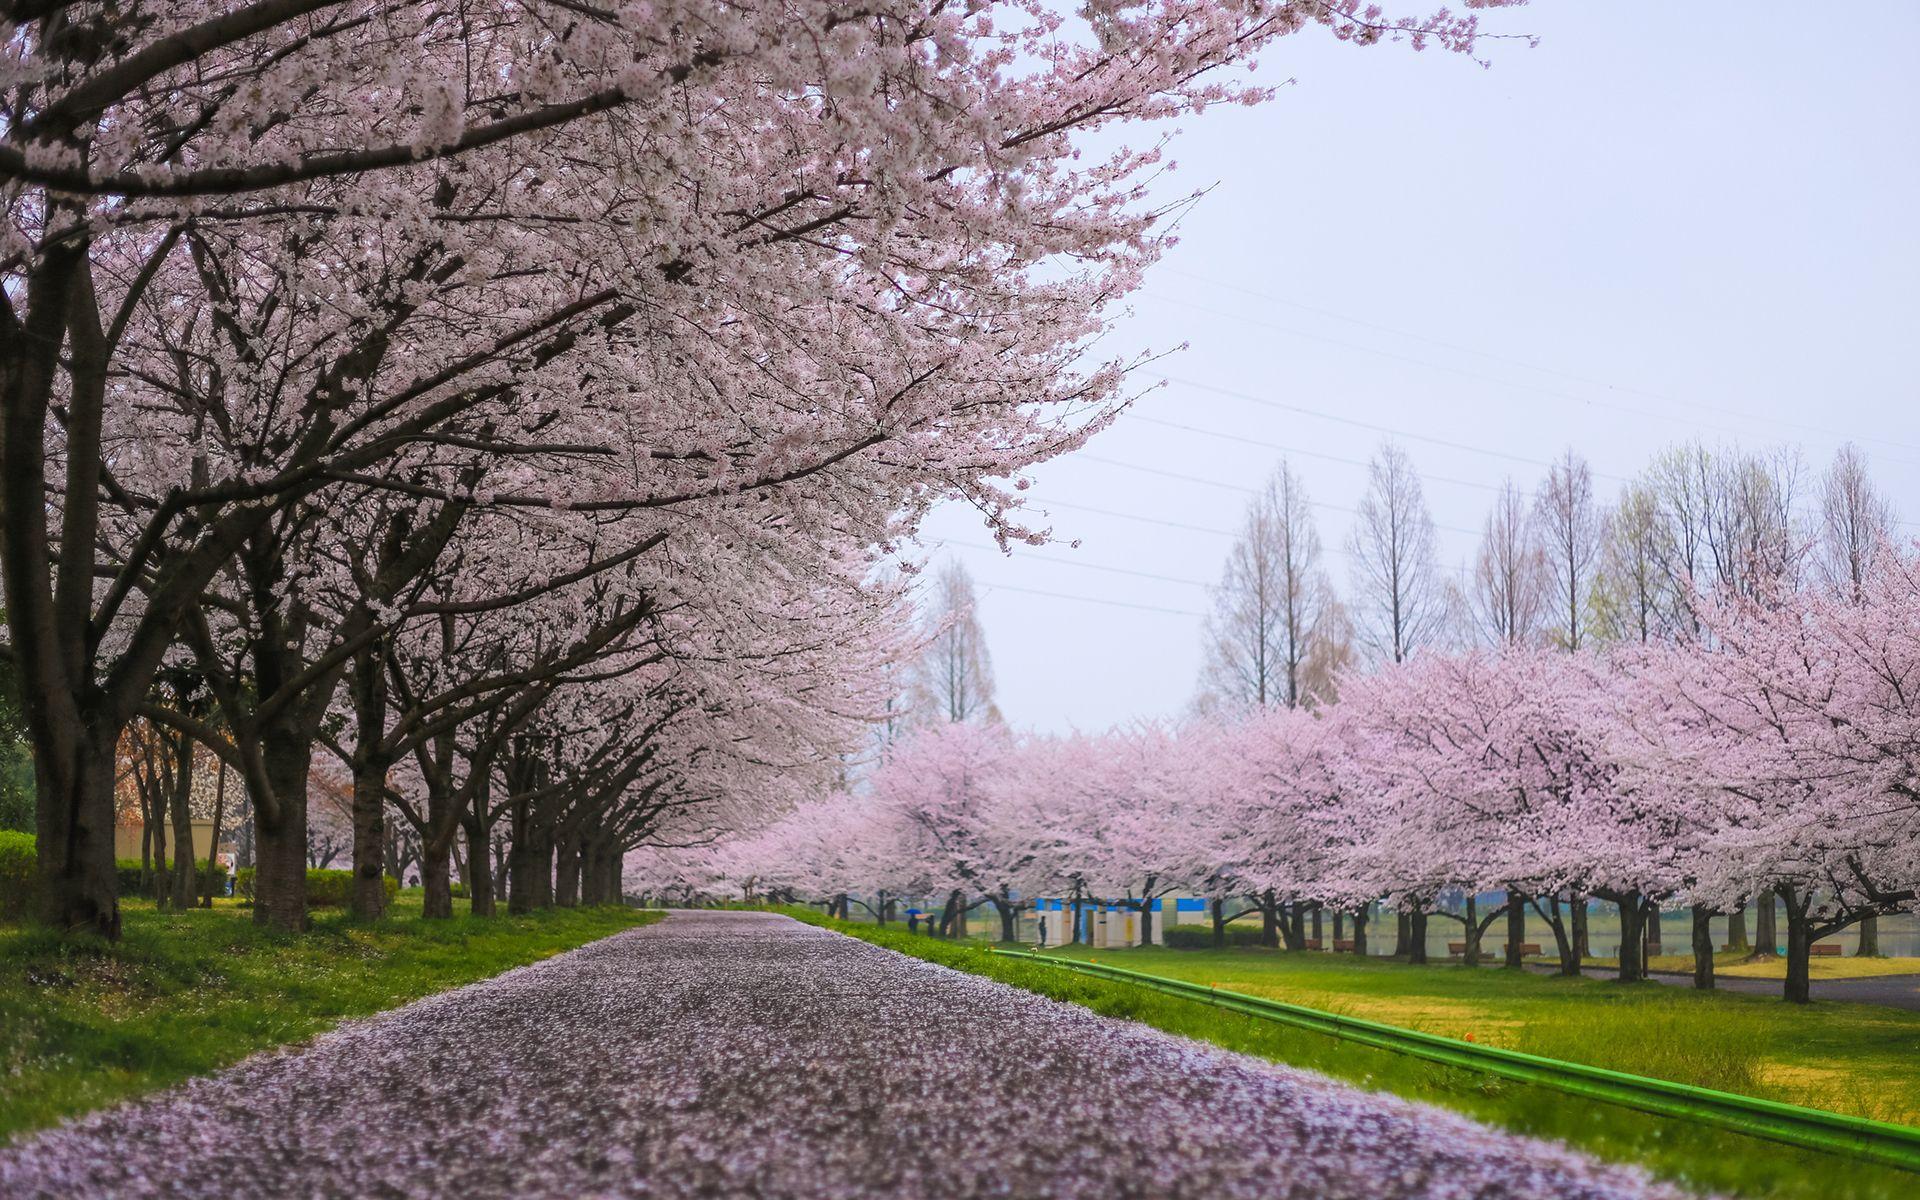 Cherry Blossom Tree Wallpapers Top Free Cherry Blossom Tree